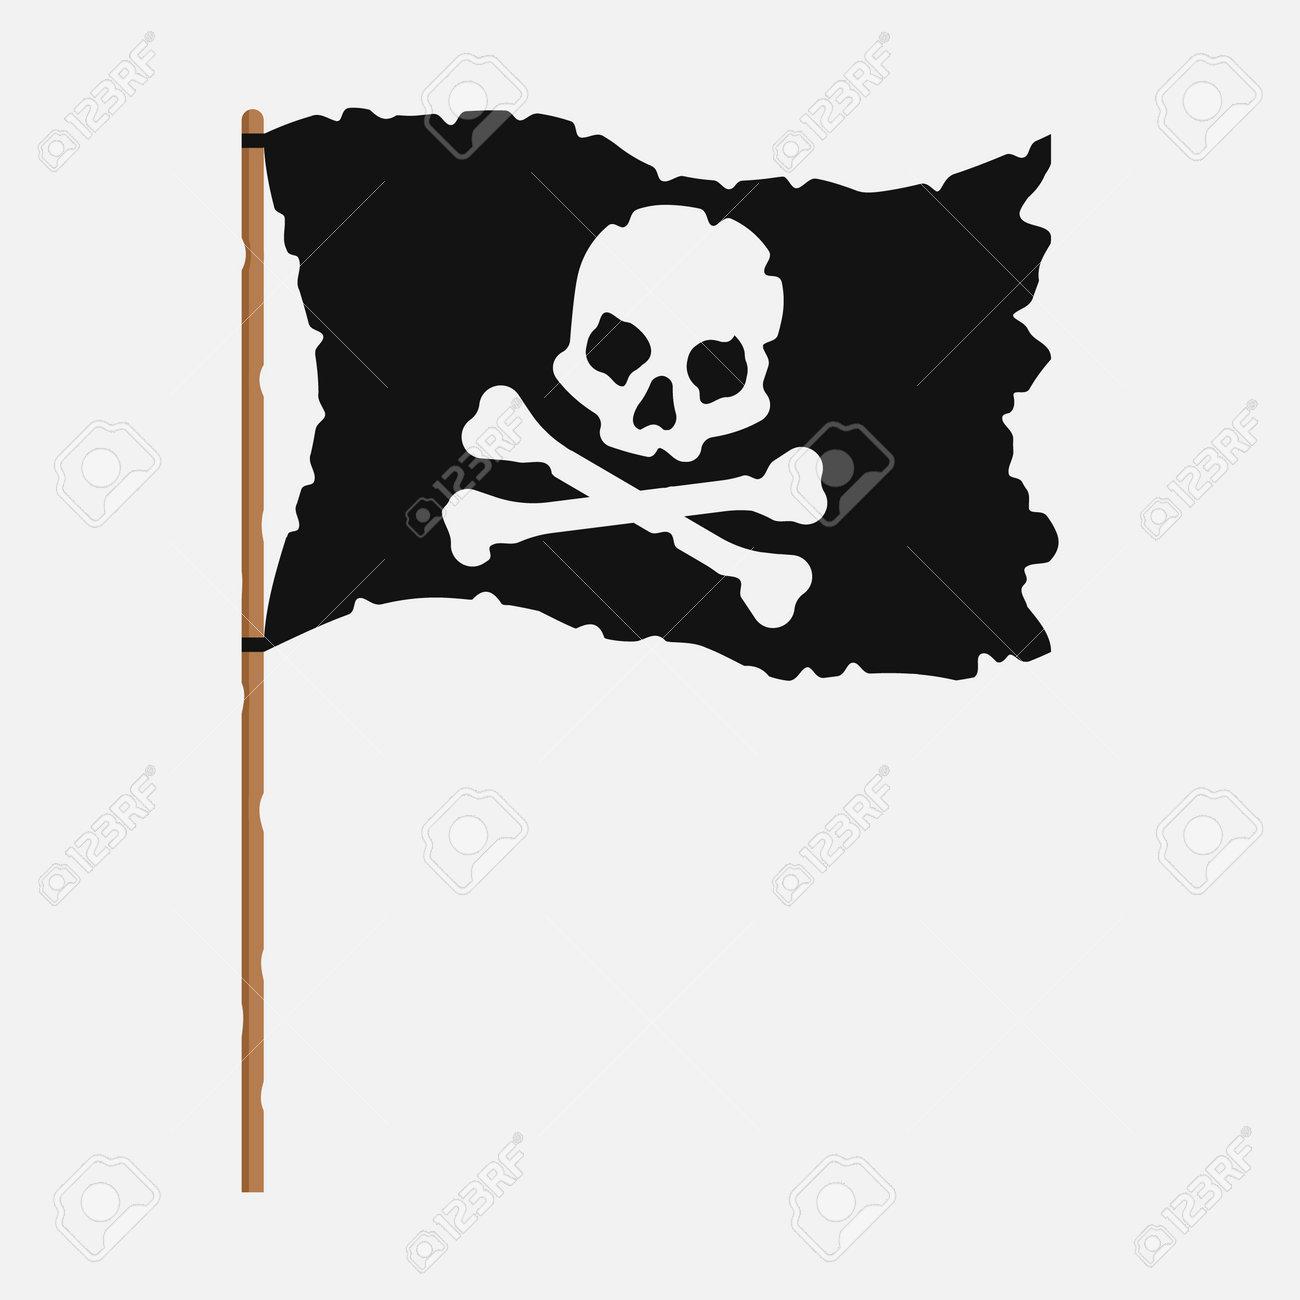 Torn pirate flag with white skull symbol. Vector illustration. - 166669126